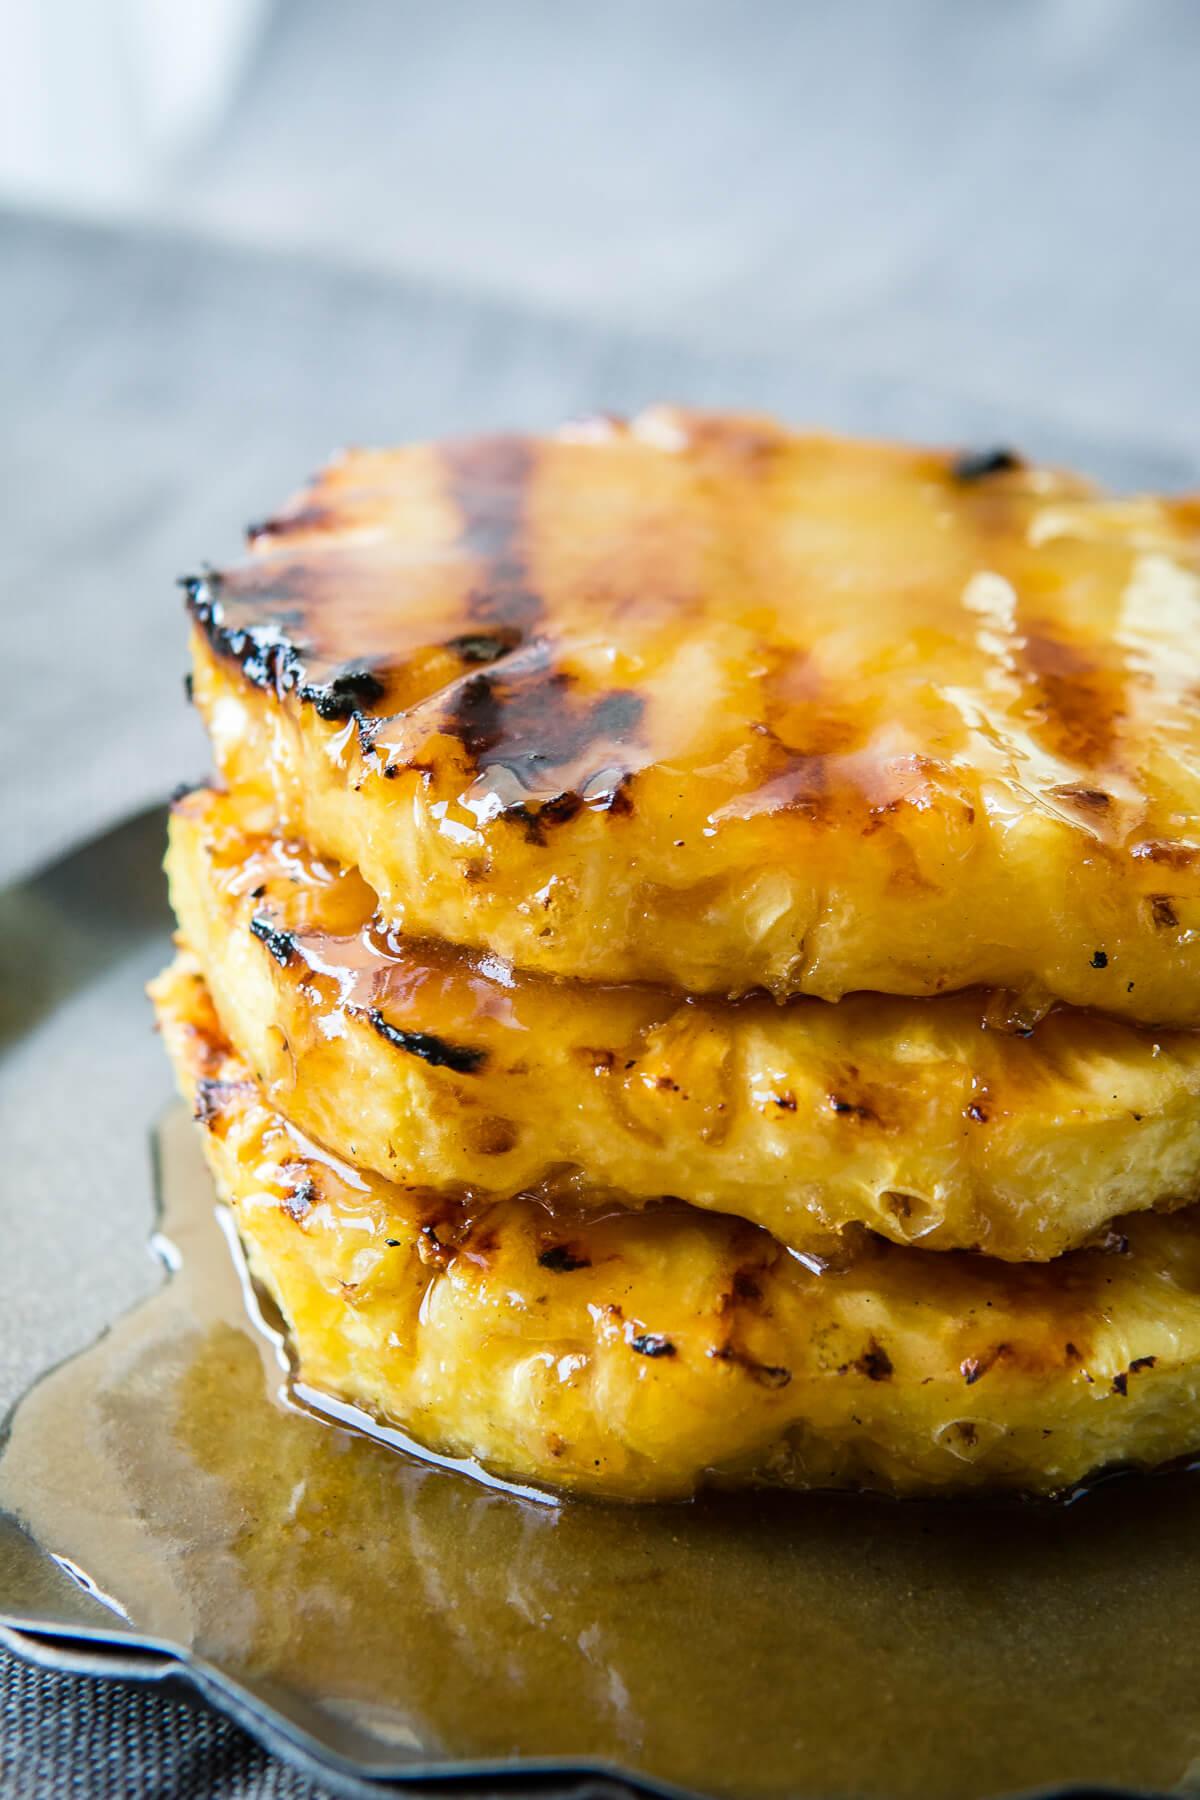 images Healthy Dessert Recipe: Grilled Pineapple Sundaes